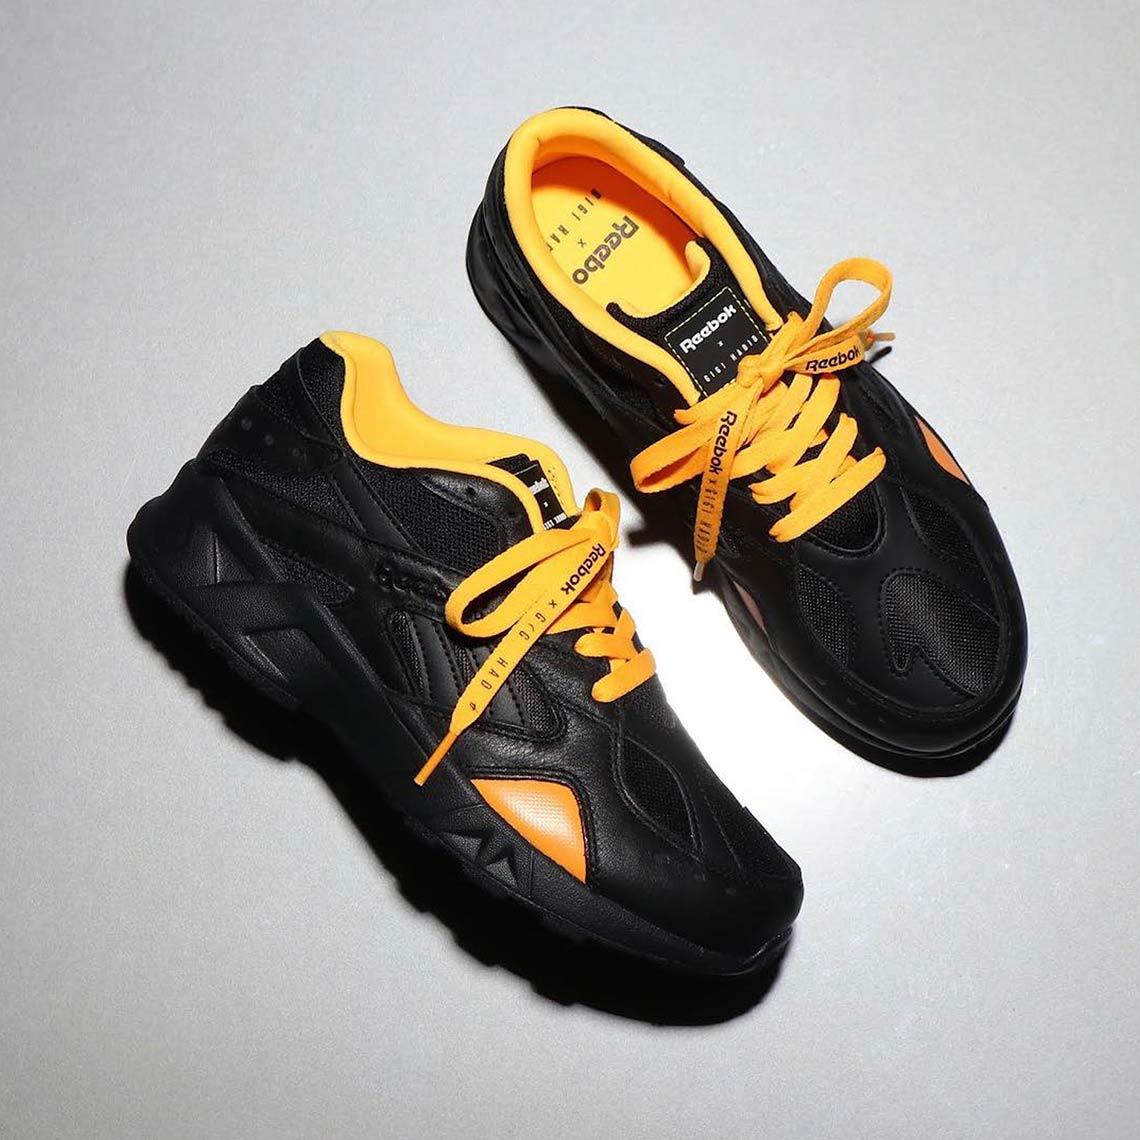 1da2d67e Gigi Hadid Reebok Aztrek First Look + Release Date | SneakerNews.com